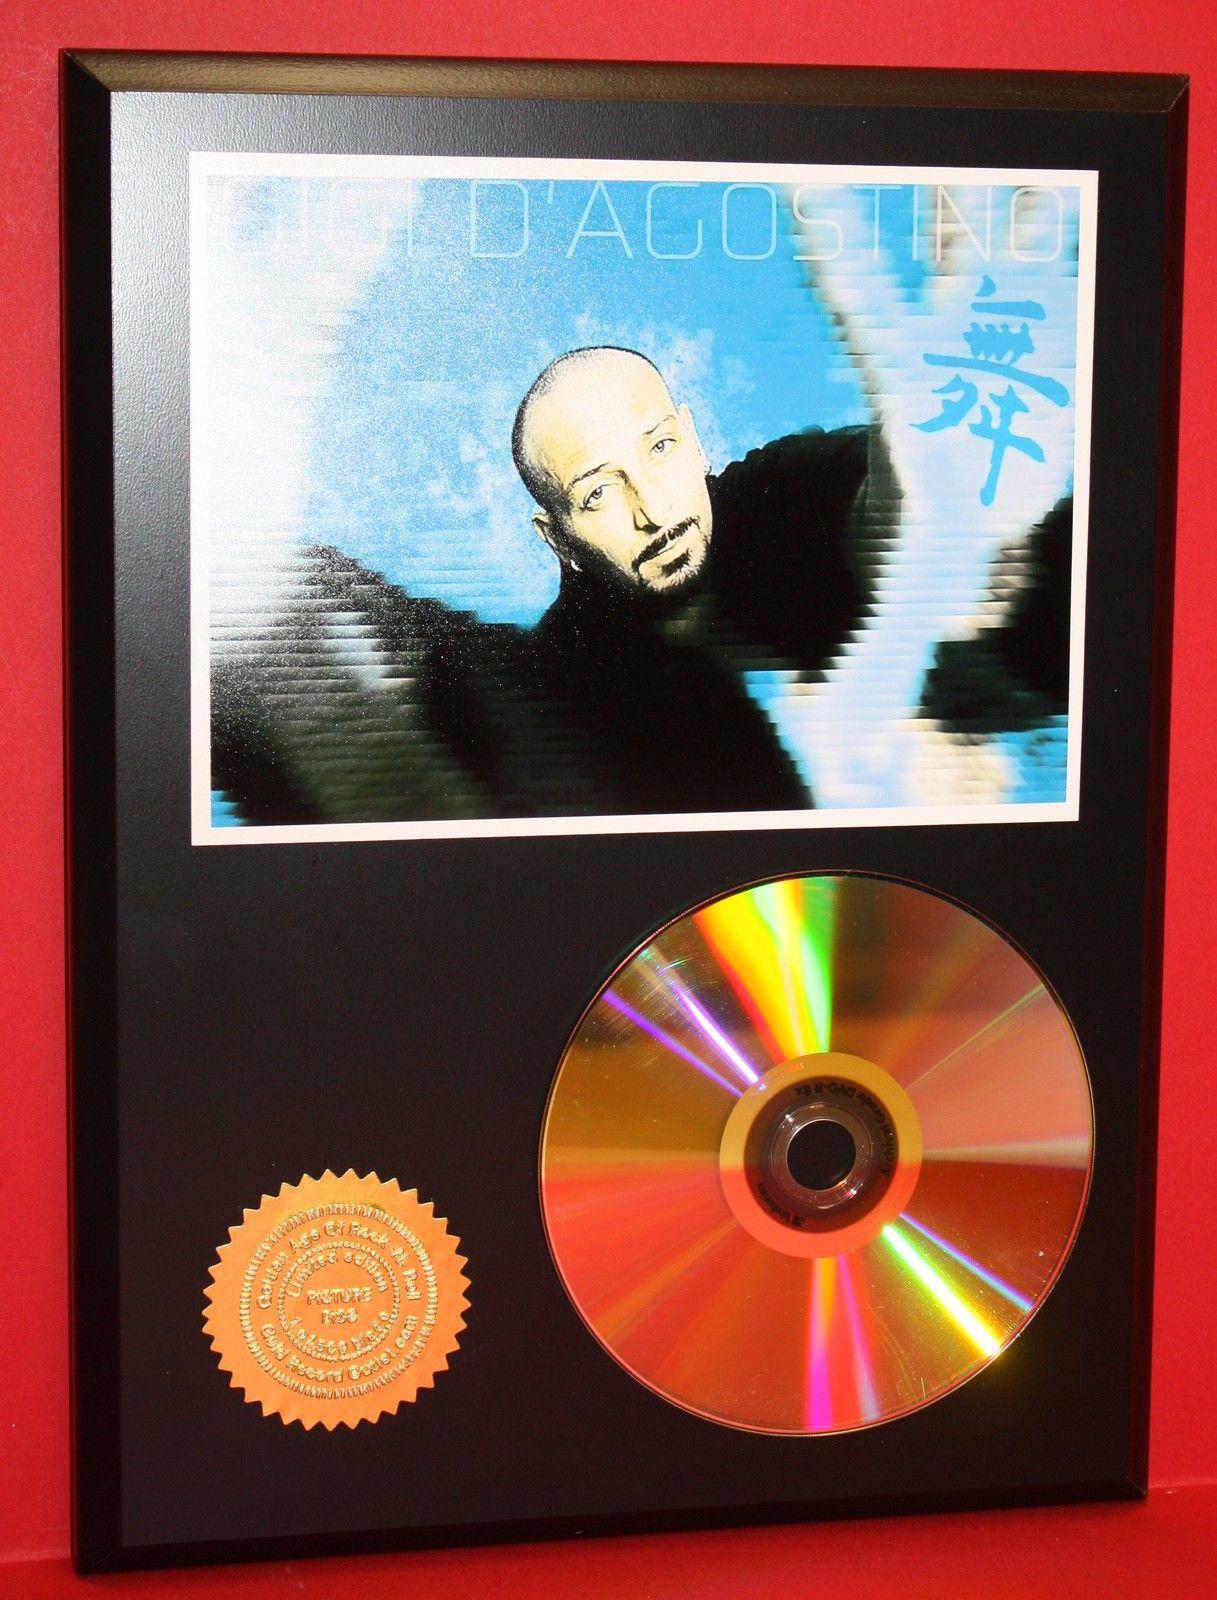 gigi d 39 agostino 24kt gold cd disc collectible rare award quality plaque gift dance electronica. Black Bedroom Furniture Sets. Home Design Ideas